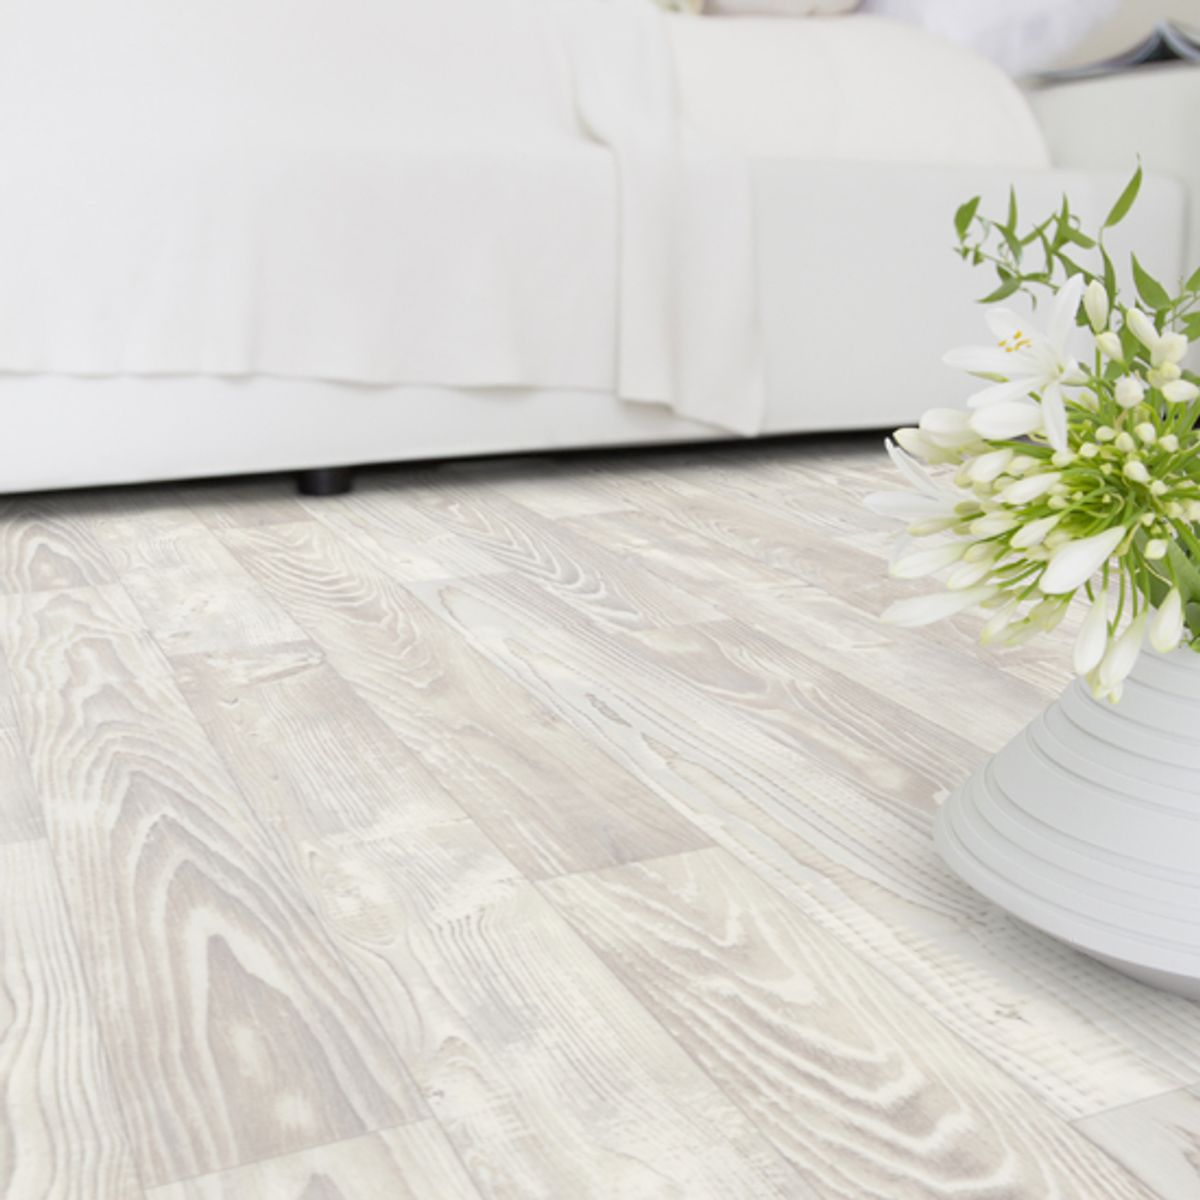 Sol vinyle effet pin blanc Lecco 400cm